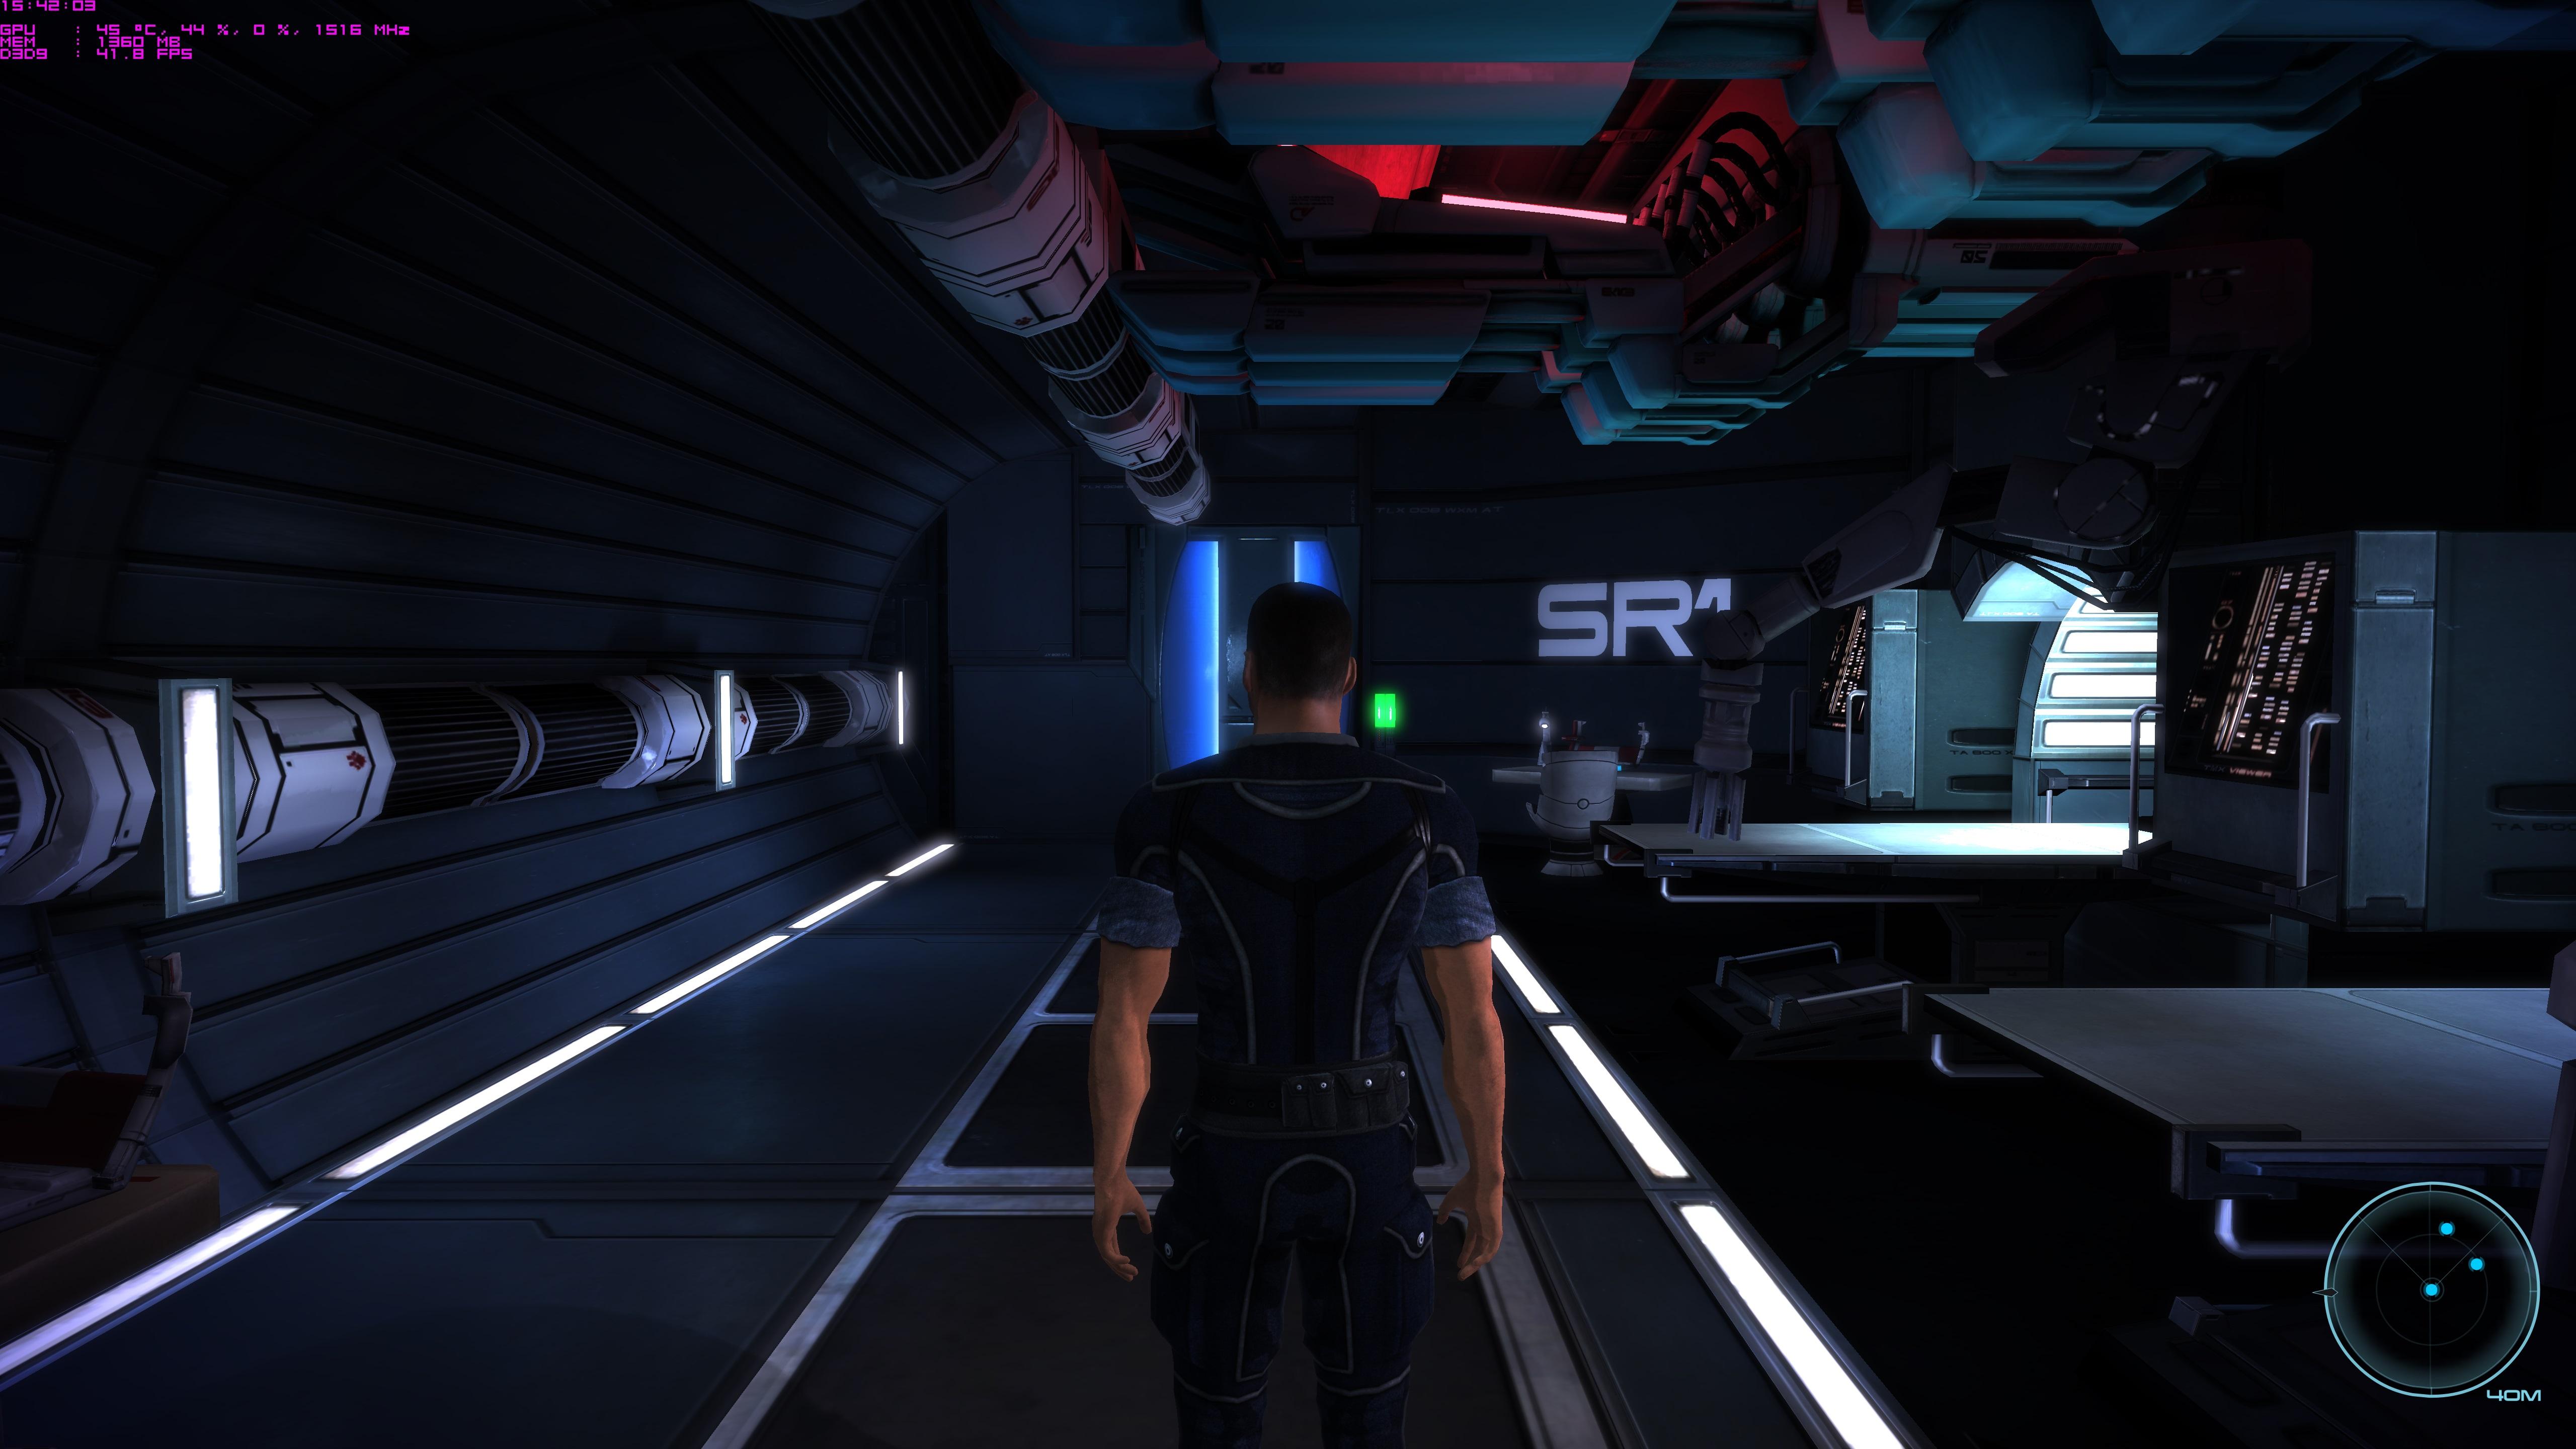 Mass Effect niedrige FPS